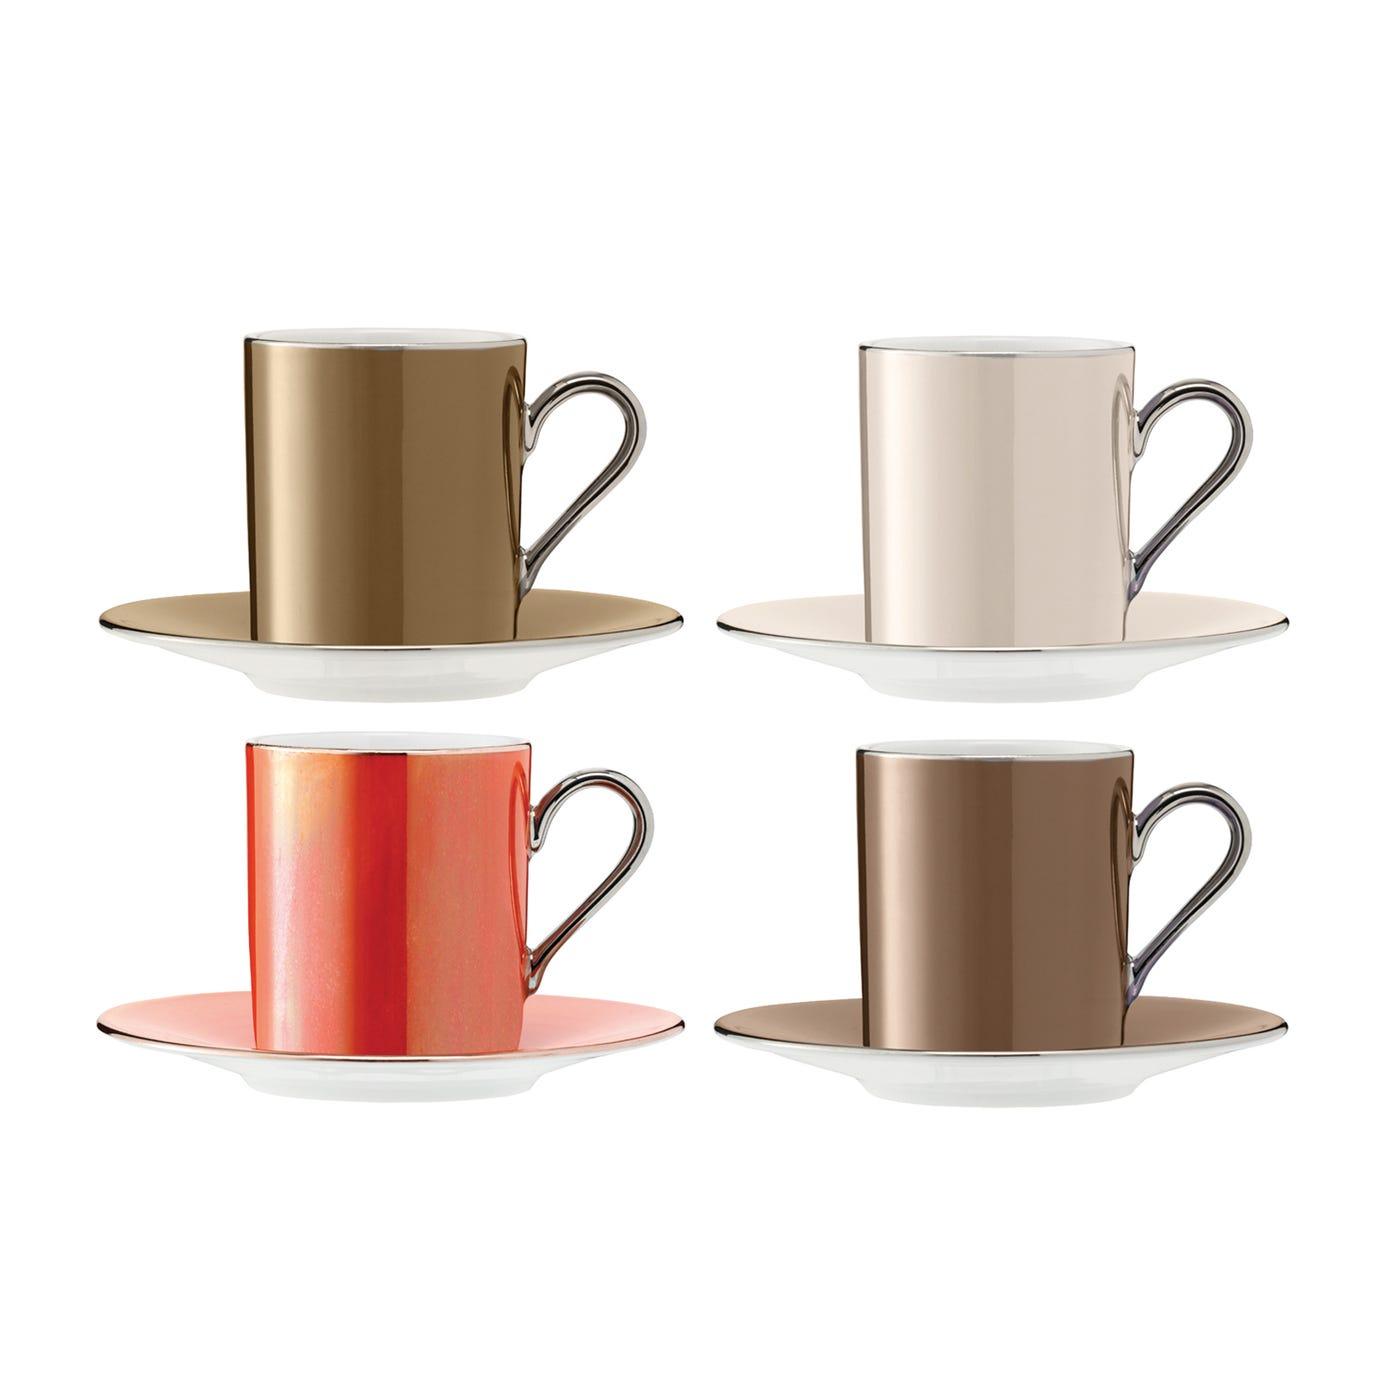 lsa international polka metallics coffee cup saucer set of 4 heal s. Black Bedroom Furniture Sets. Home Design Ideas